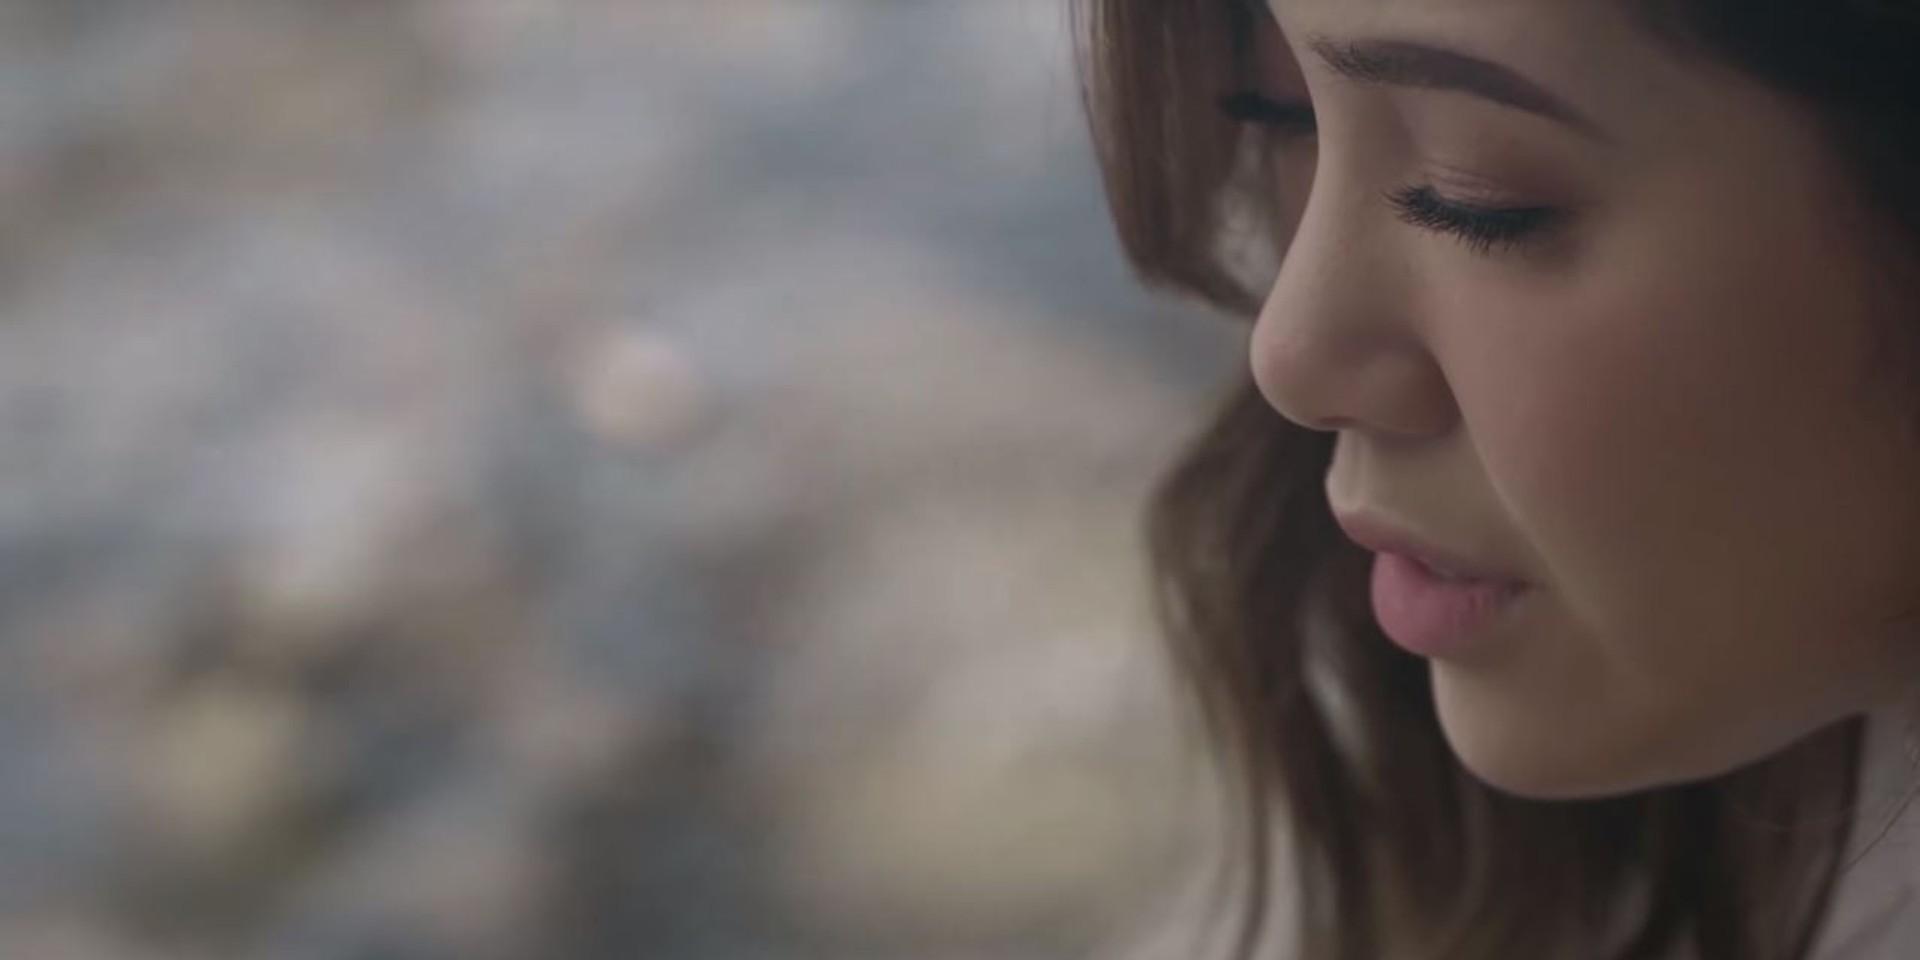 Moira Dela Torre unveils emotional proposal video 'Tagpuan' – watch